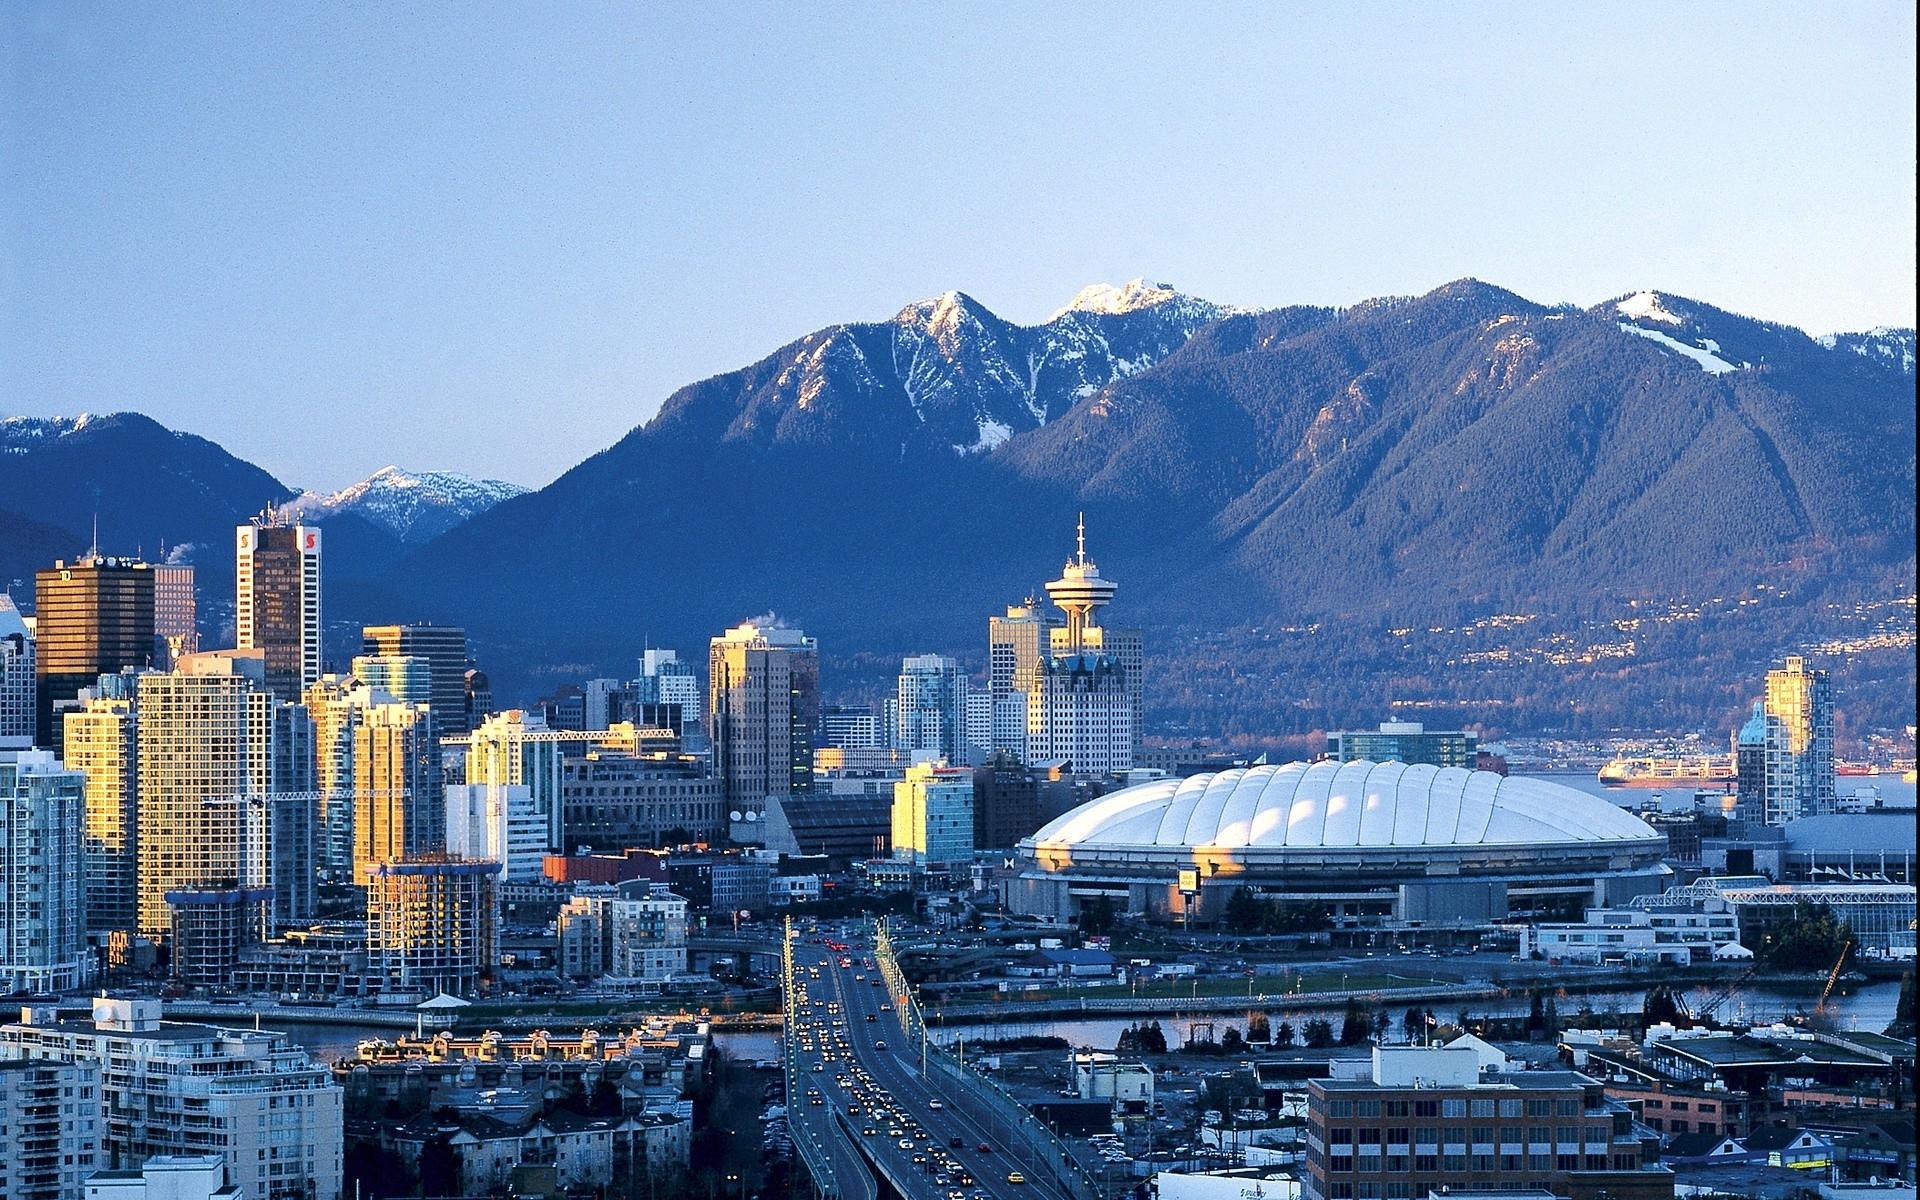 Man Made - City Vancouver Wallpaper